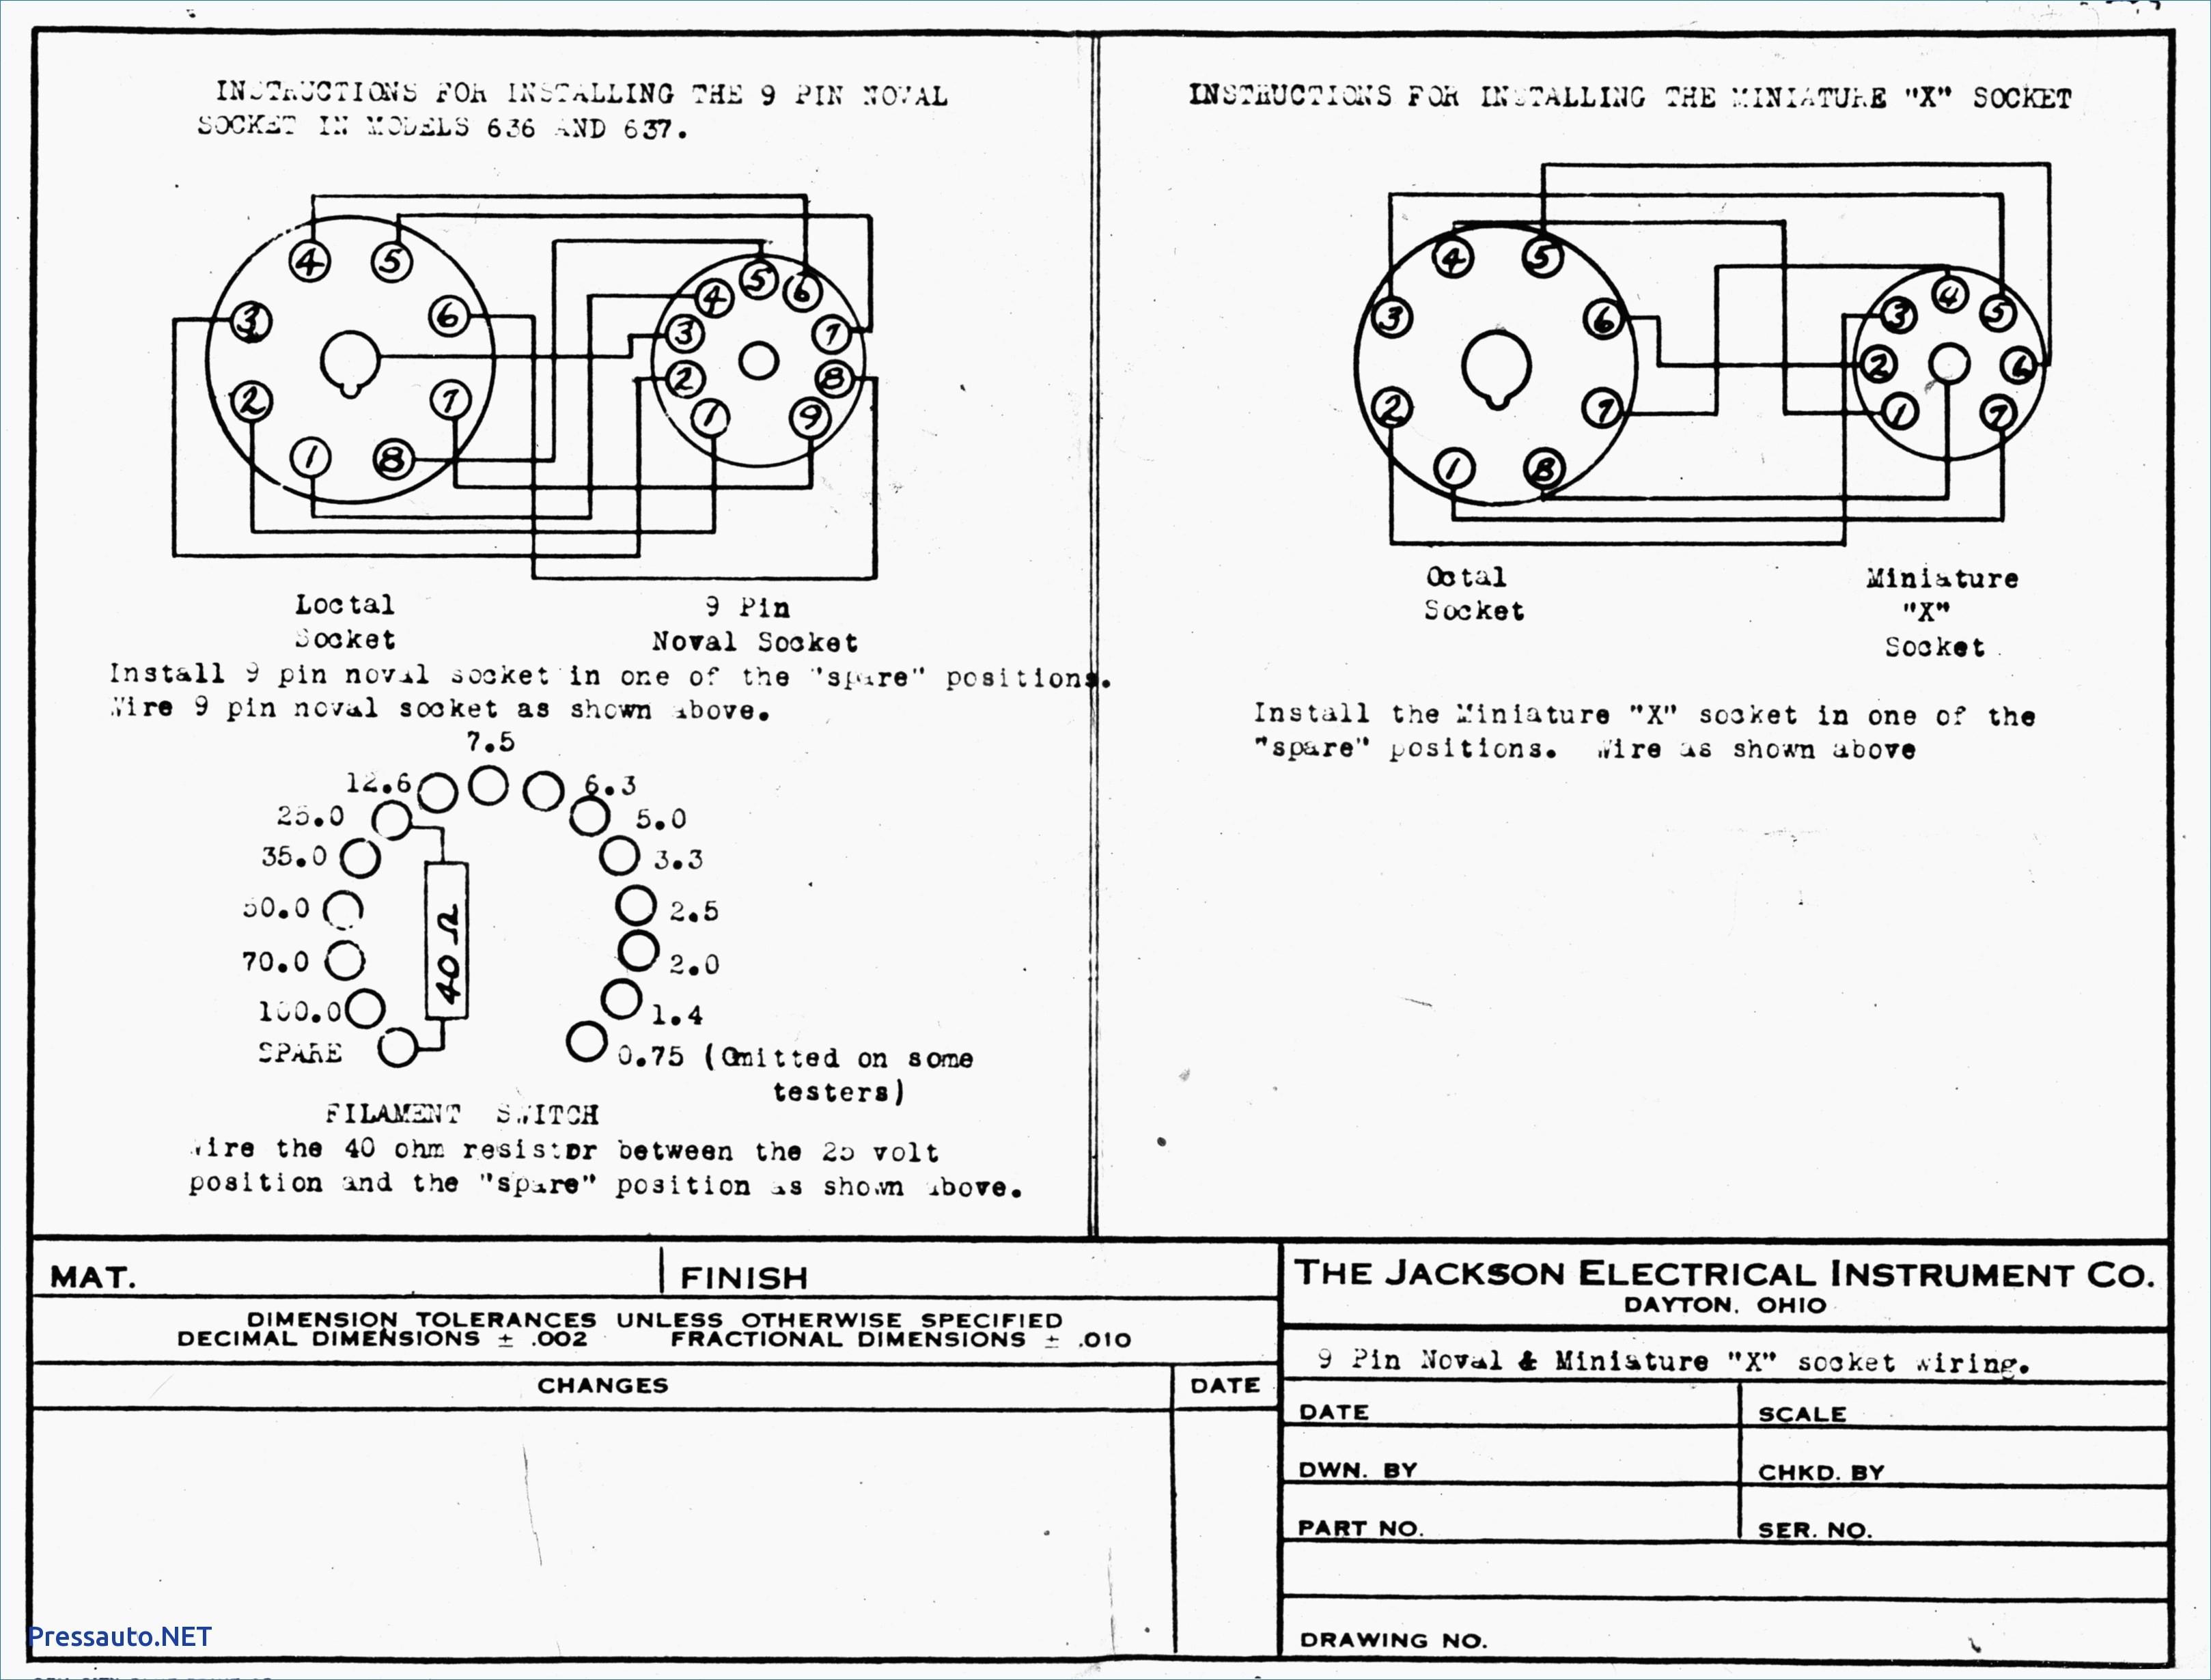 Kenwood 16 Pin Wiring Harness Diagram Unique Generous Pioneer